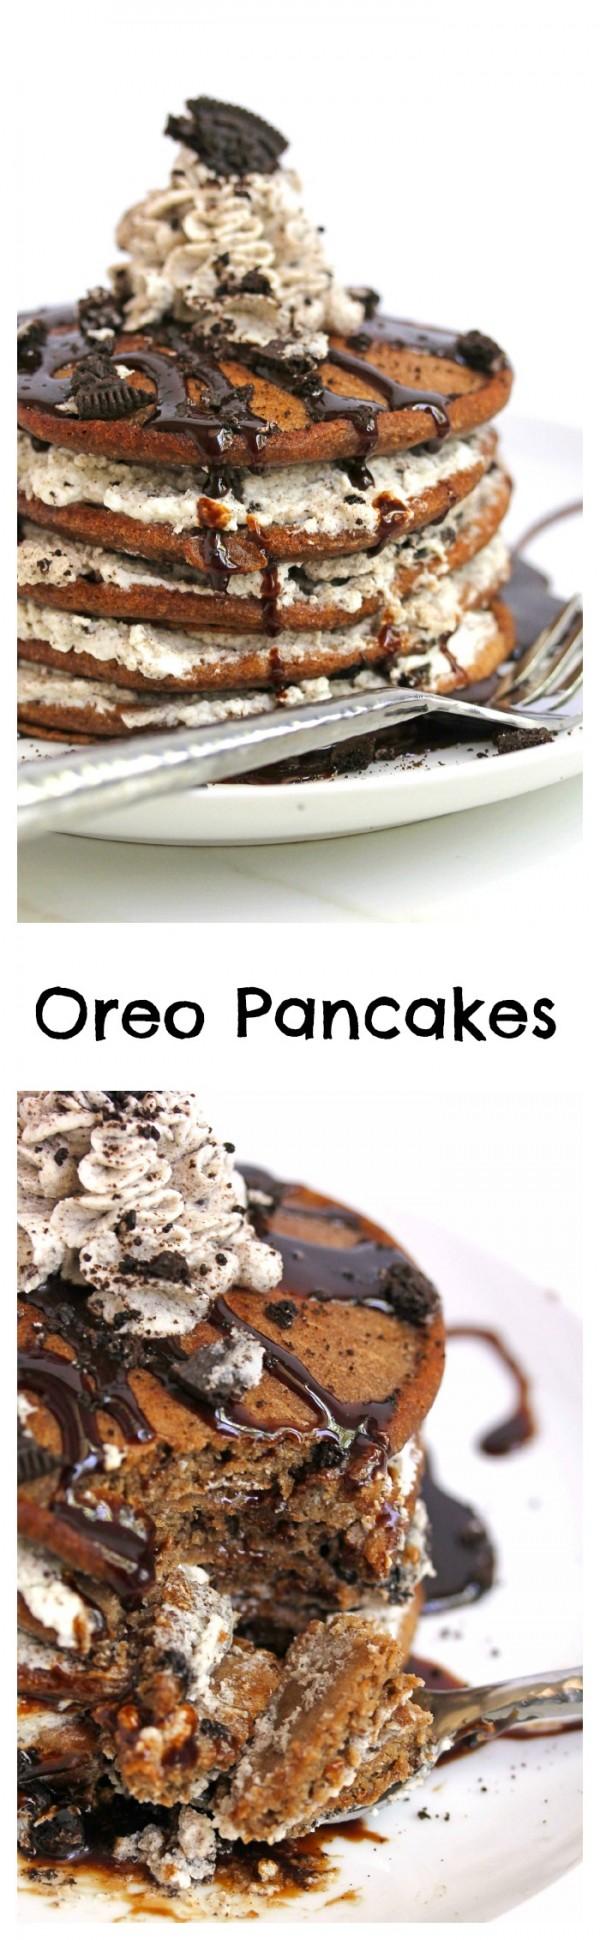 Get the recipe Oreo Pancakes @recipes_to_go